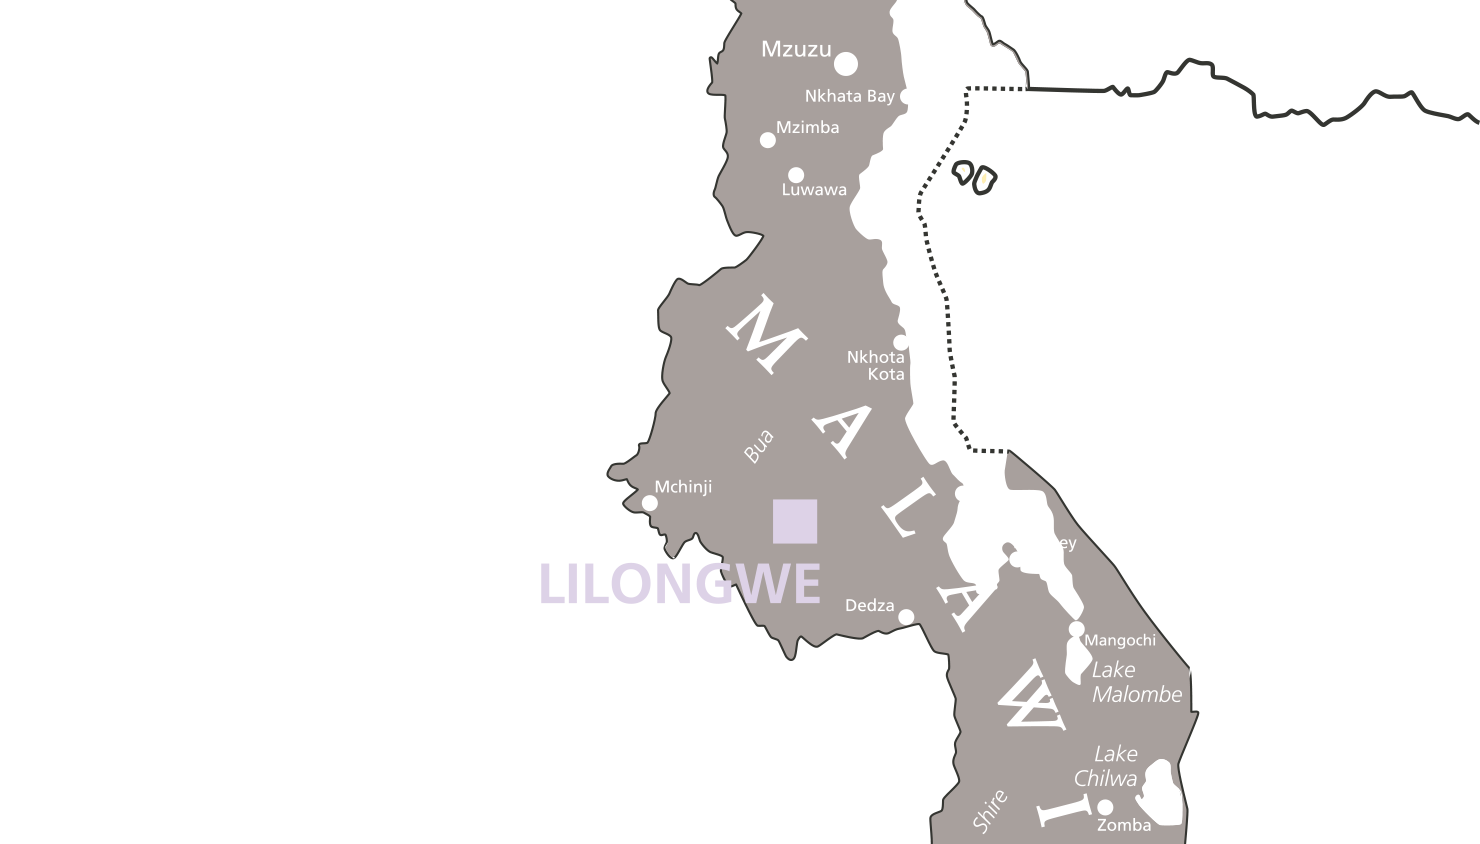 Girls Sponsorship Program Lilongwe Malawi The Mordecai Project - Malawi map png